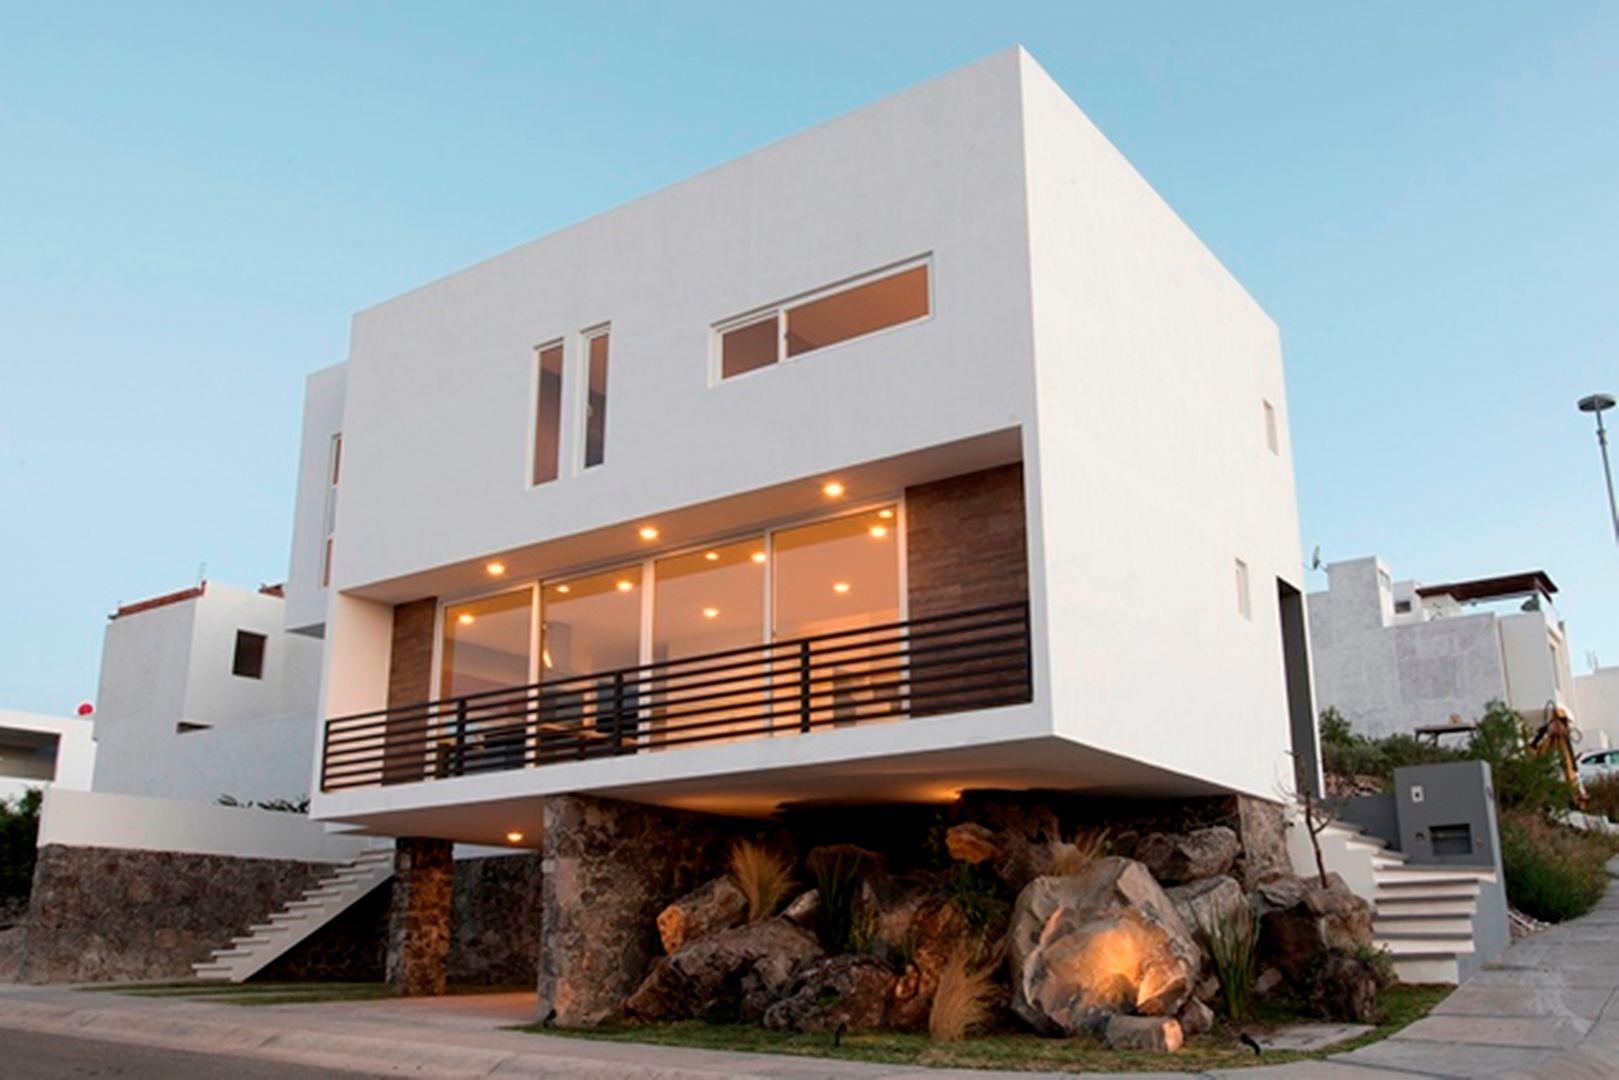 Fachadas minimalistas 10 diseos impresionantes